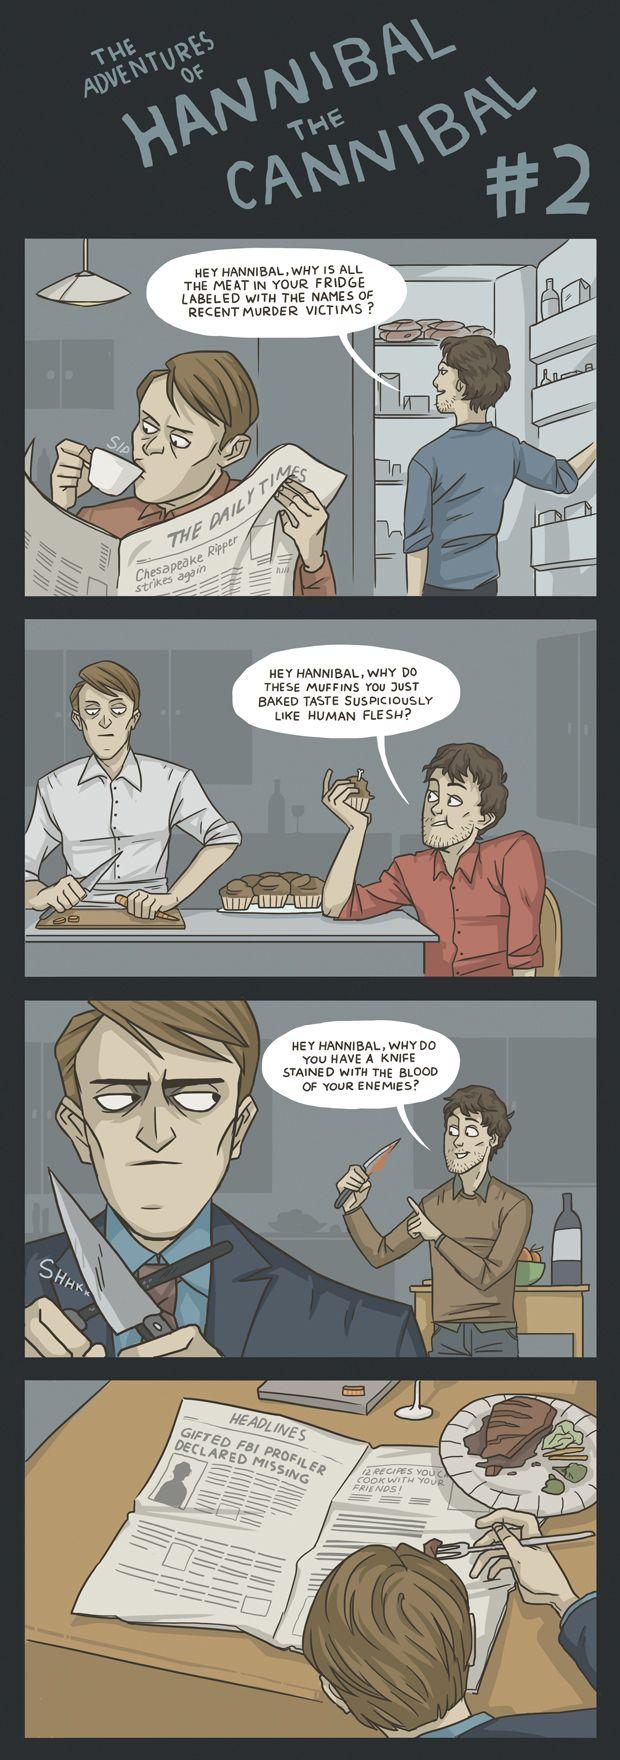 (Comic) The Adventures of Hannibal the Cannibal #2 by ekzotik.deviantart.com on @deviantART